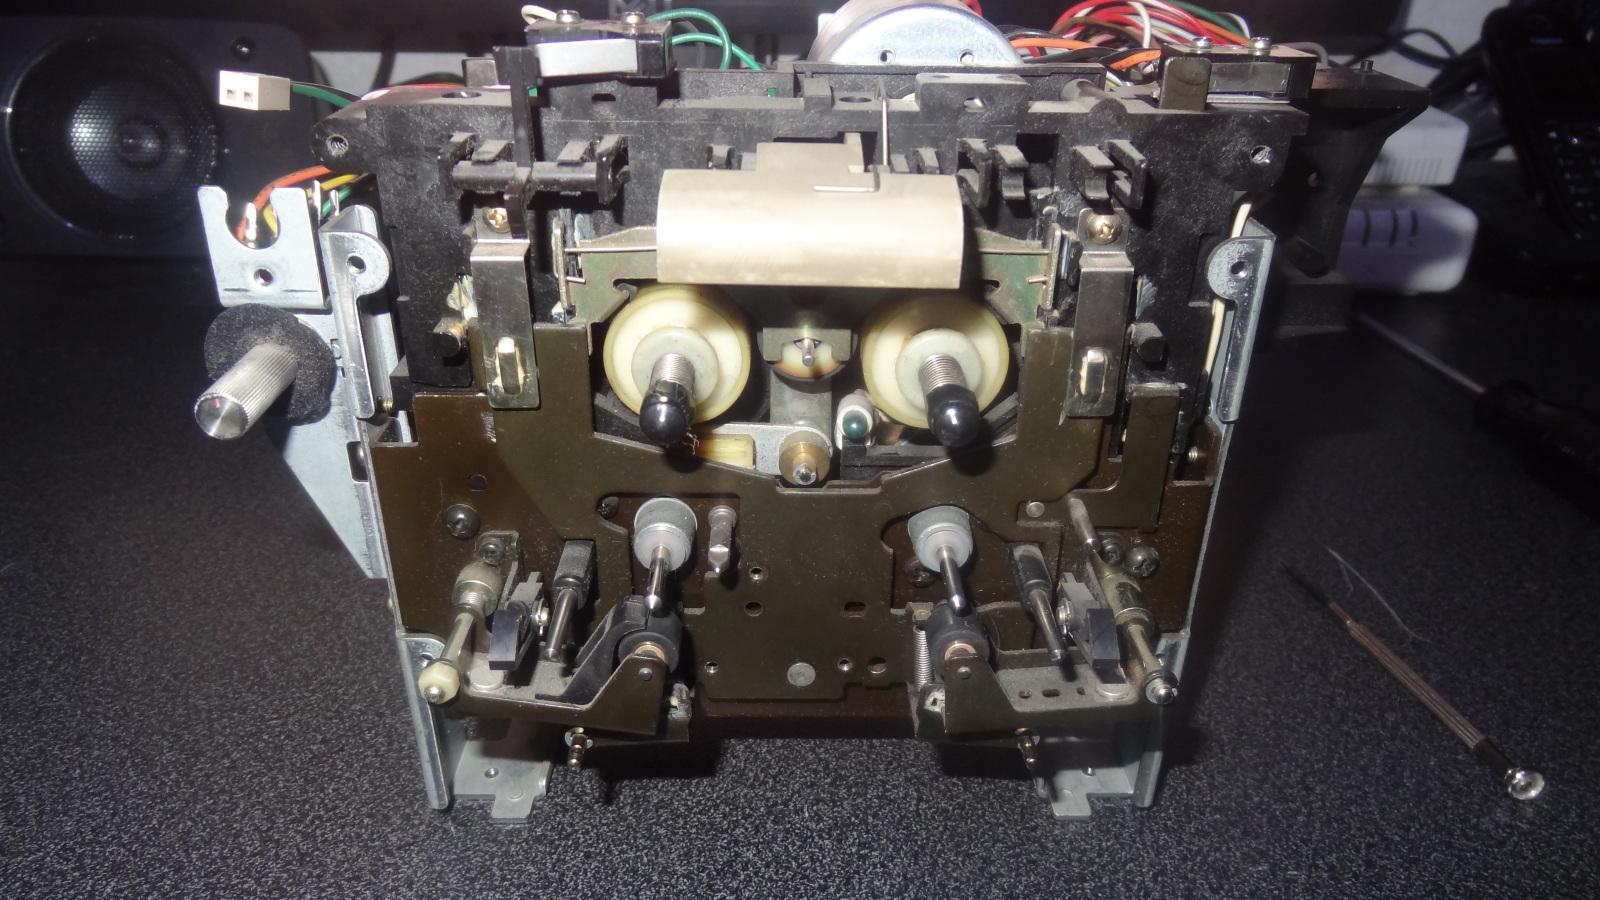 Pioneer CT-F1250 20770hx